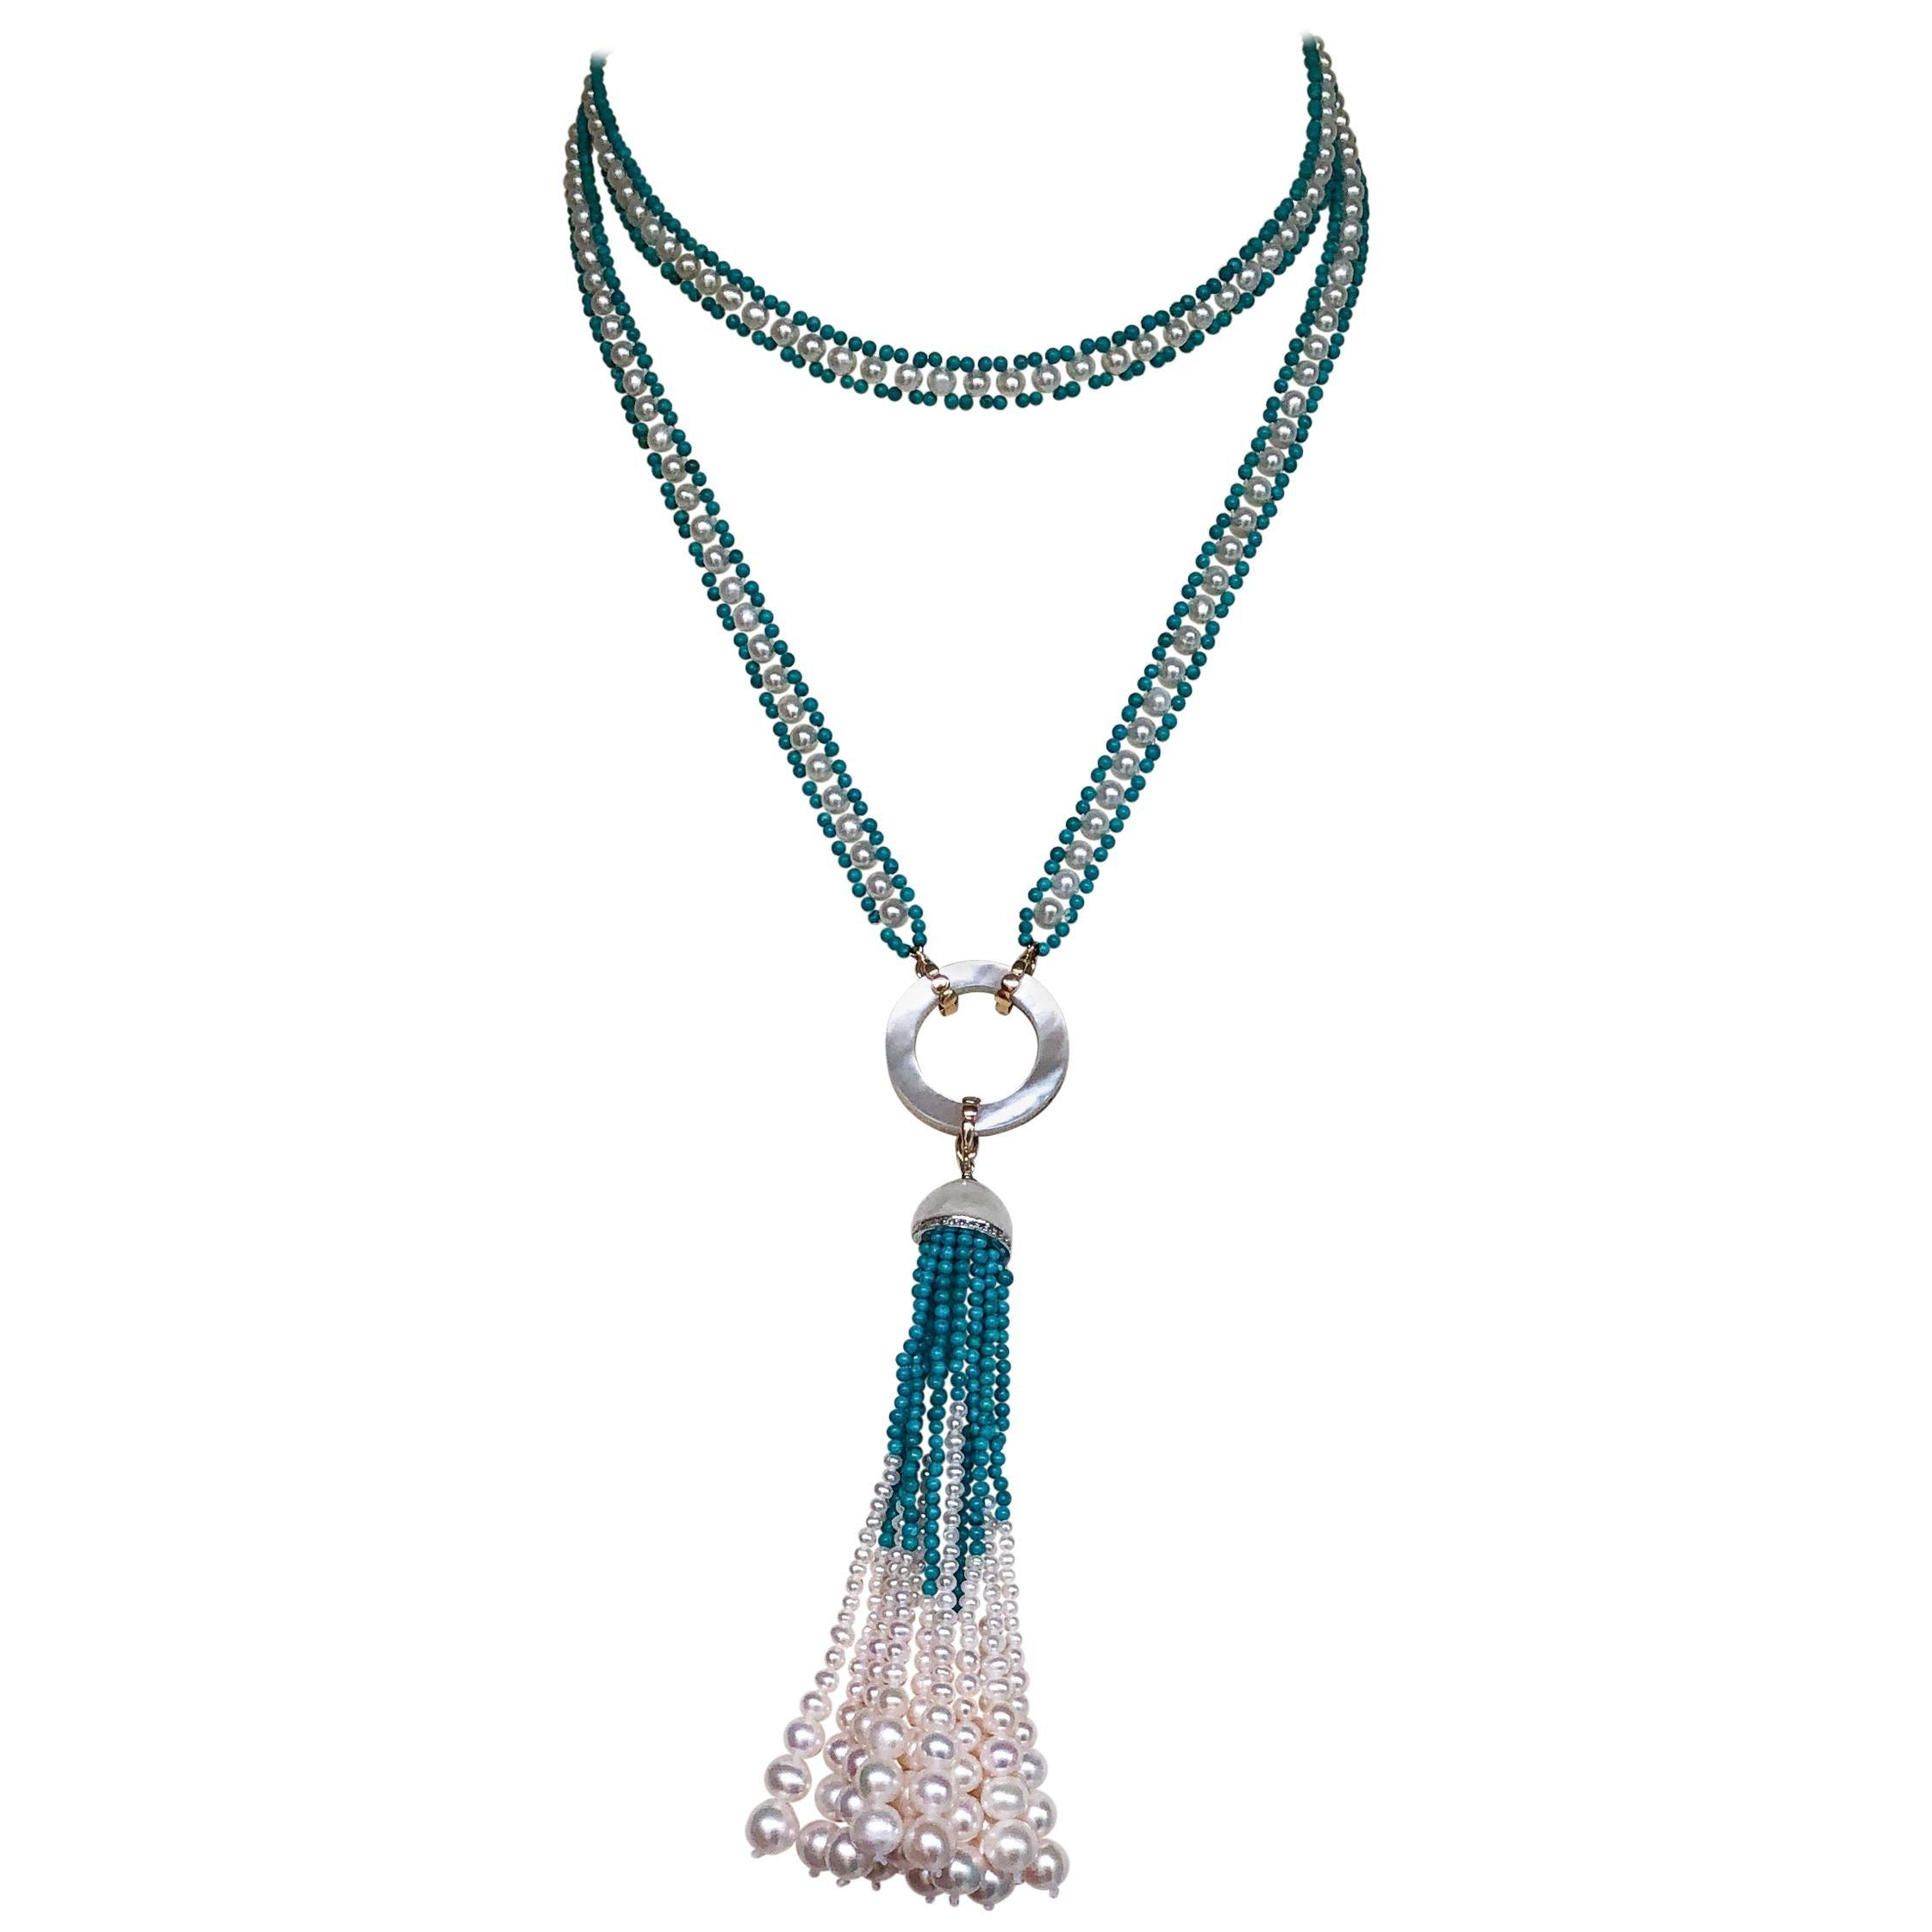 Marina J. Woven Pearl and Turquoise Beaded Sautoir with Graduated Pearl Tassel